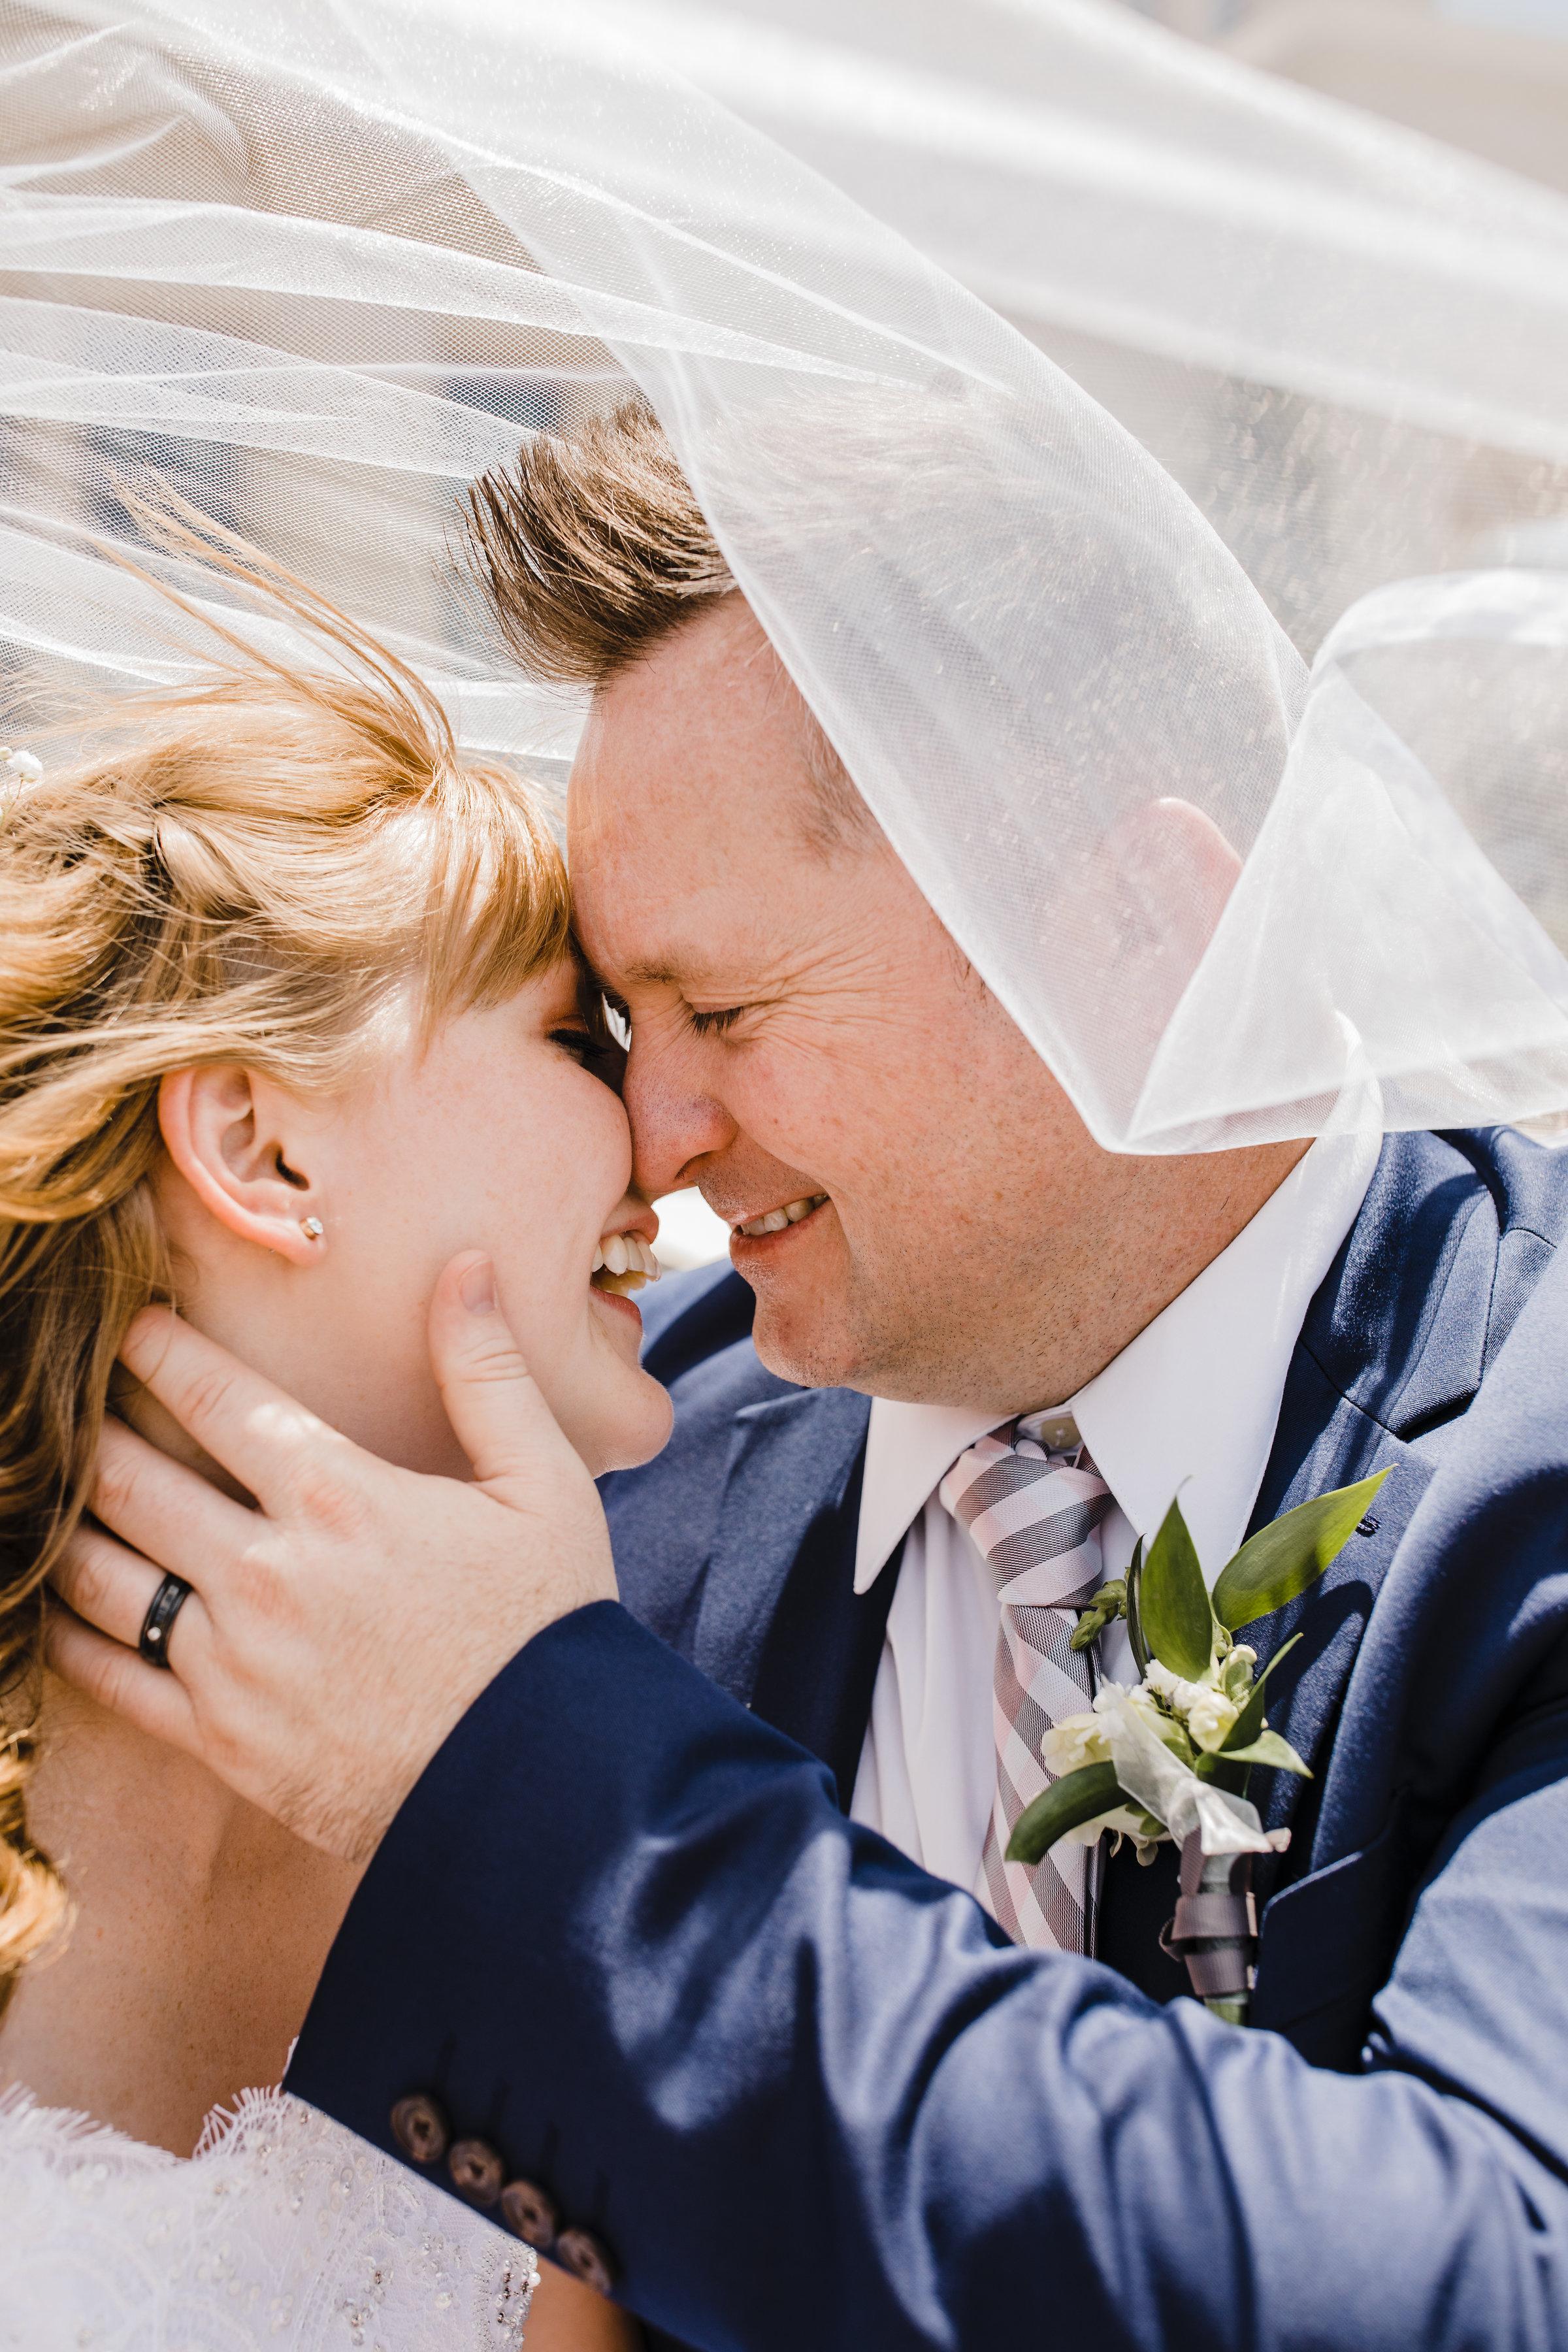 wedding photographer in logan utah flying veil kissing smiling romantic